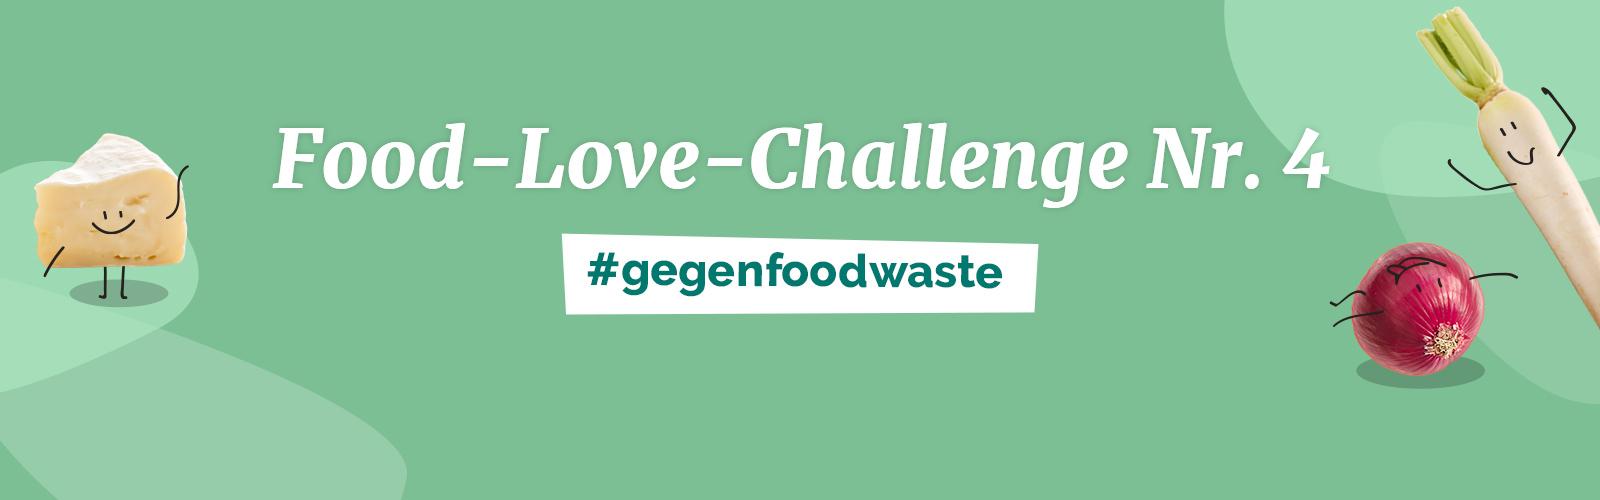 Food Love Challenge Nr. 4